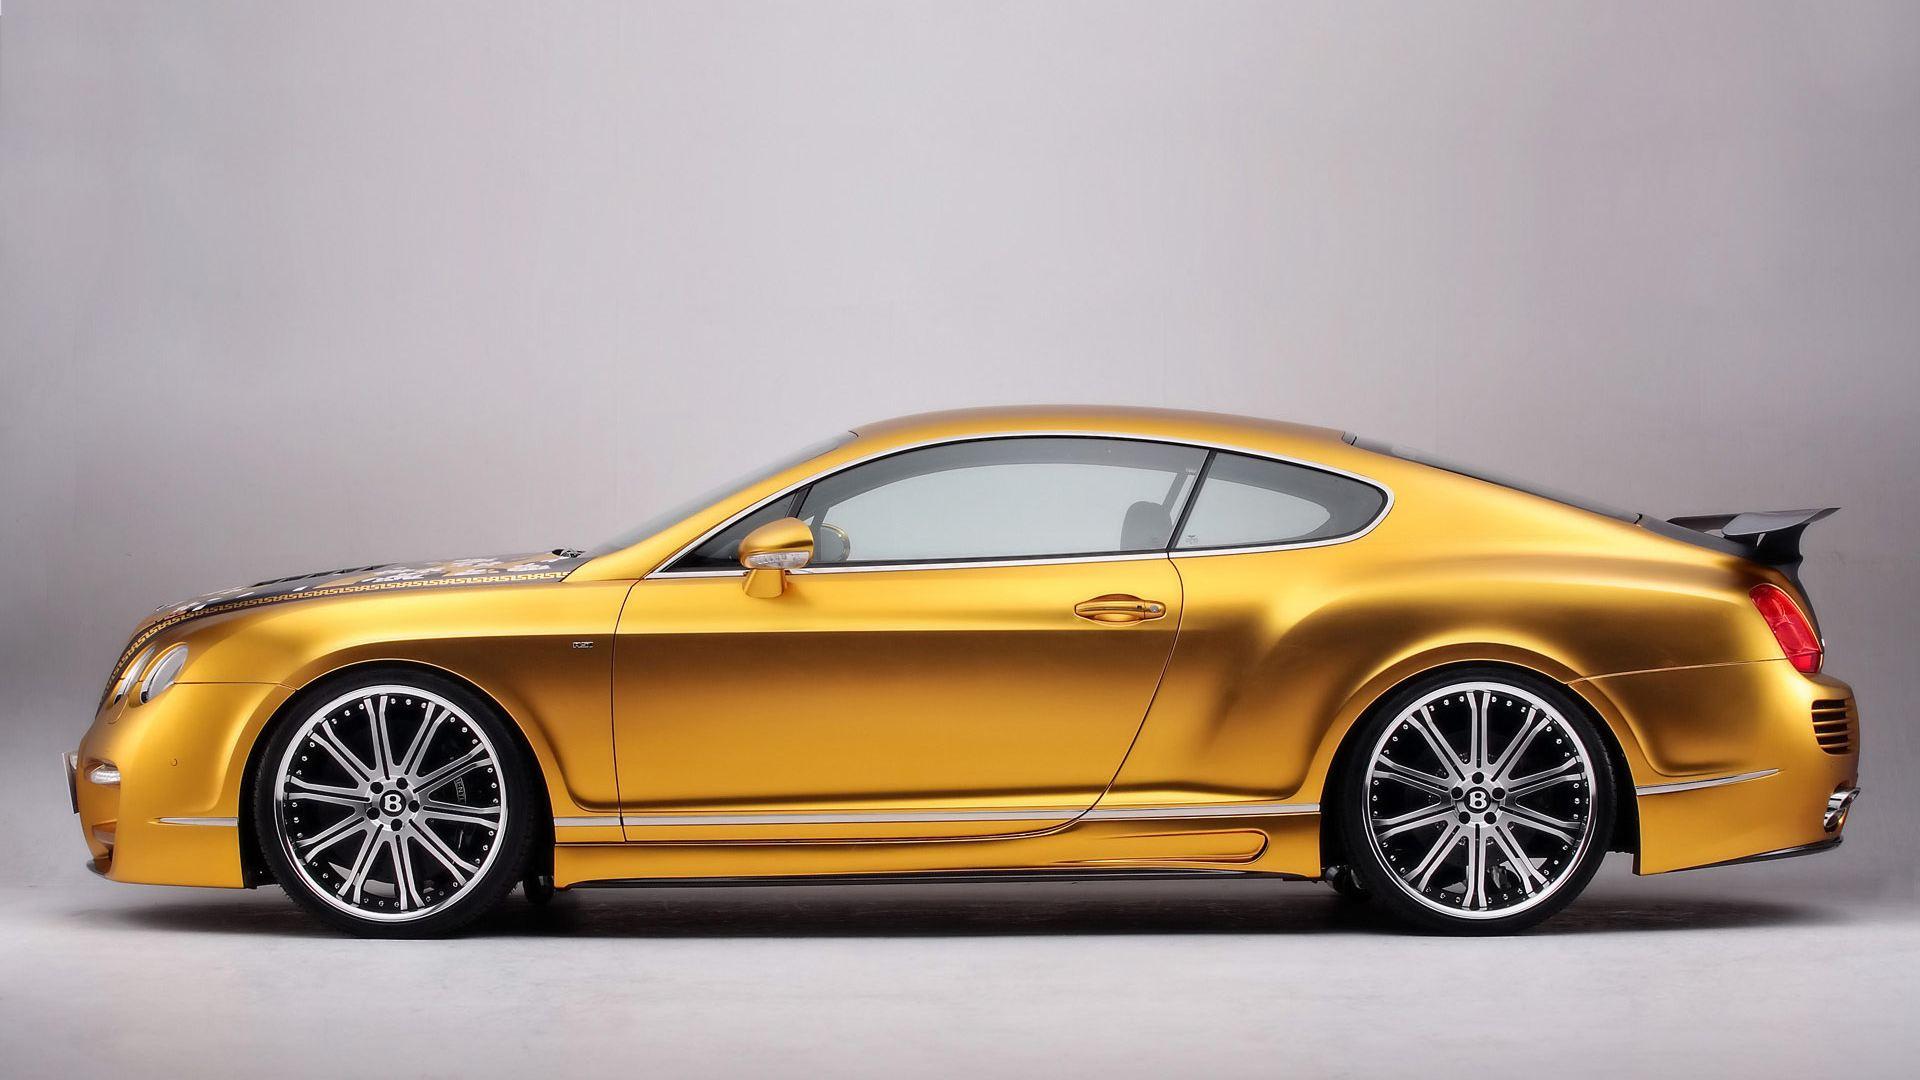 Black And Gold Sports Cars 17 Desktop Wallpaper